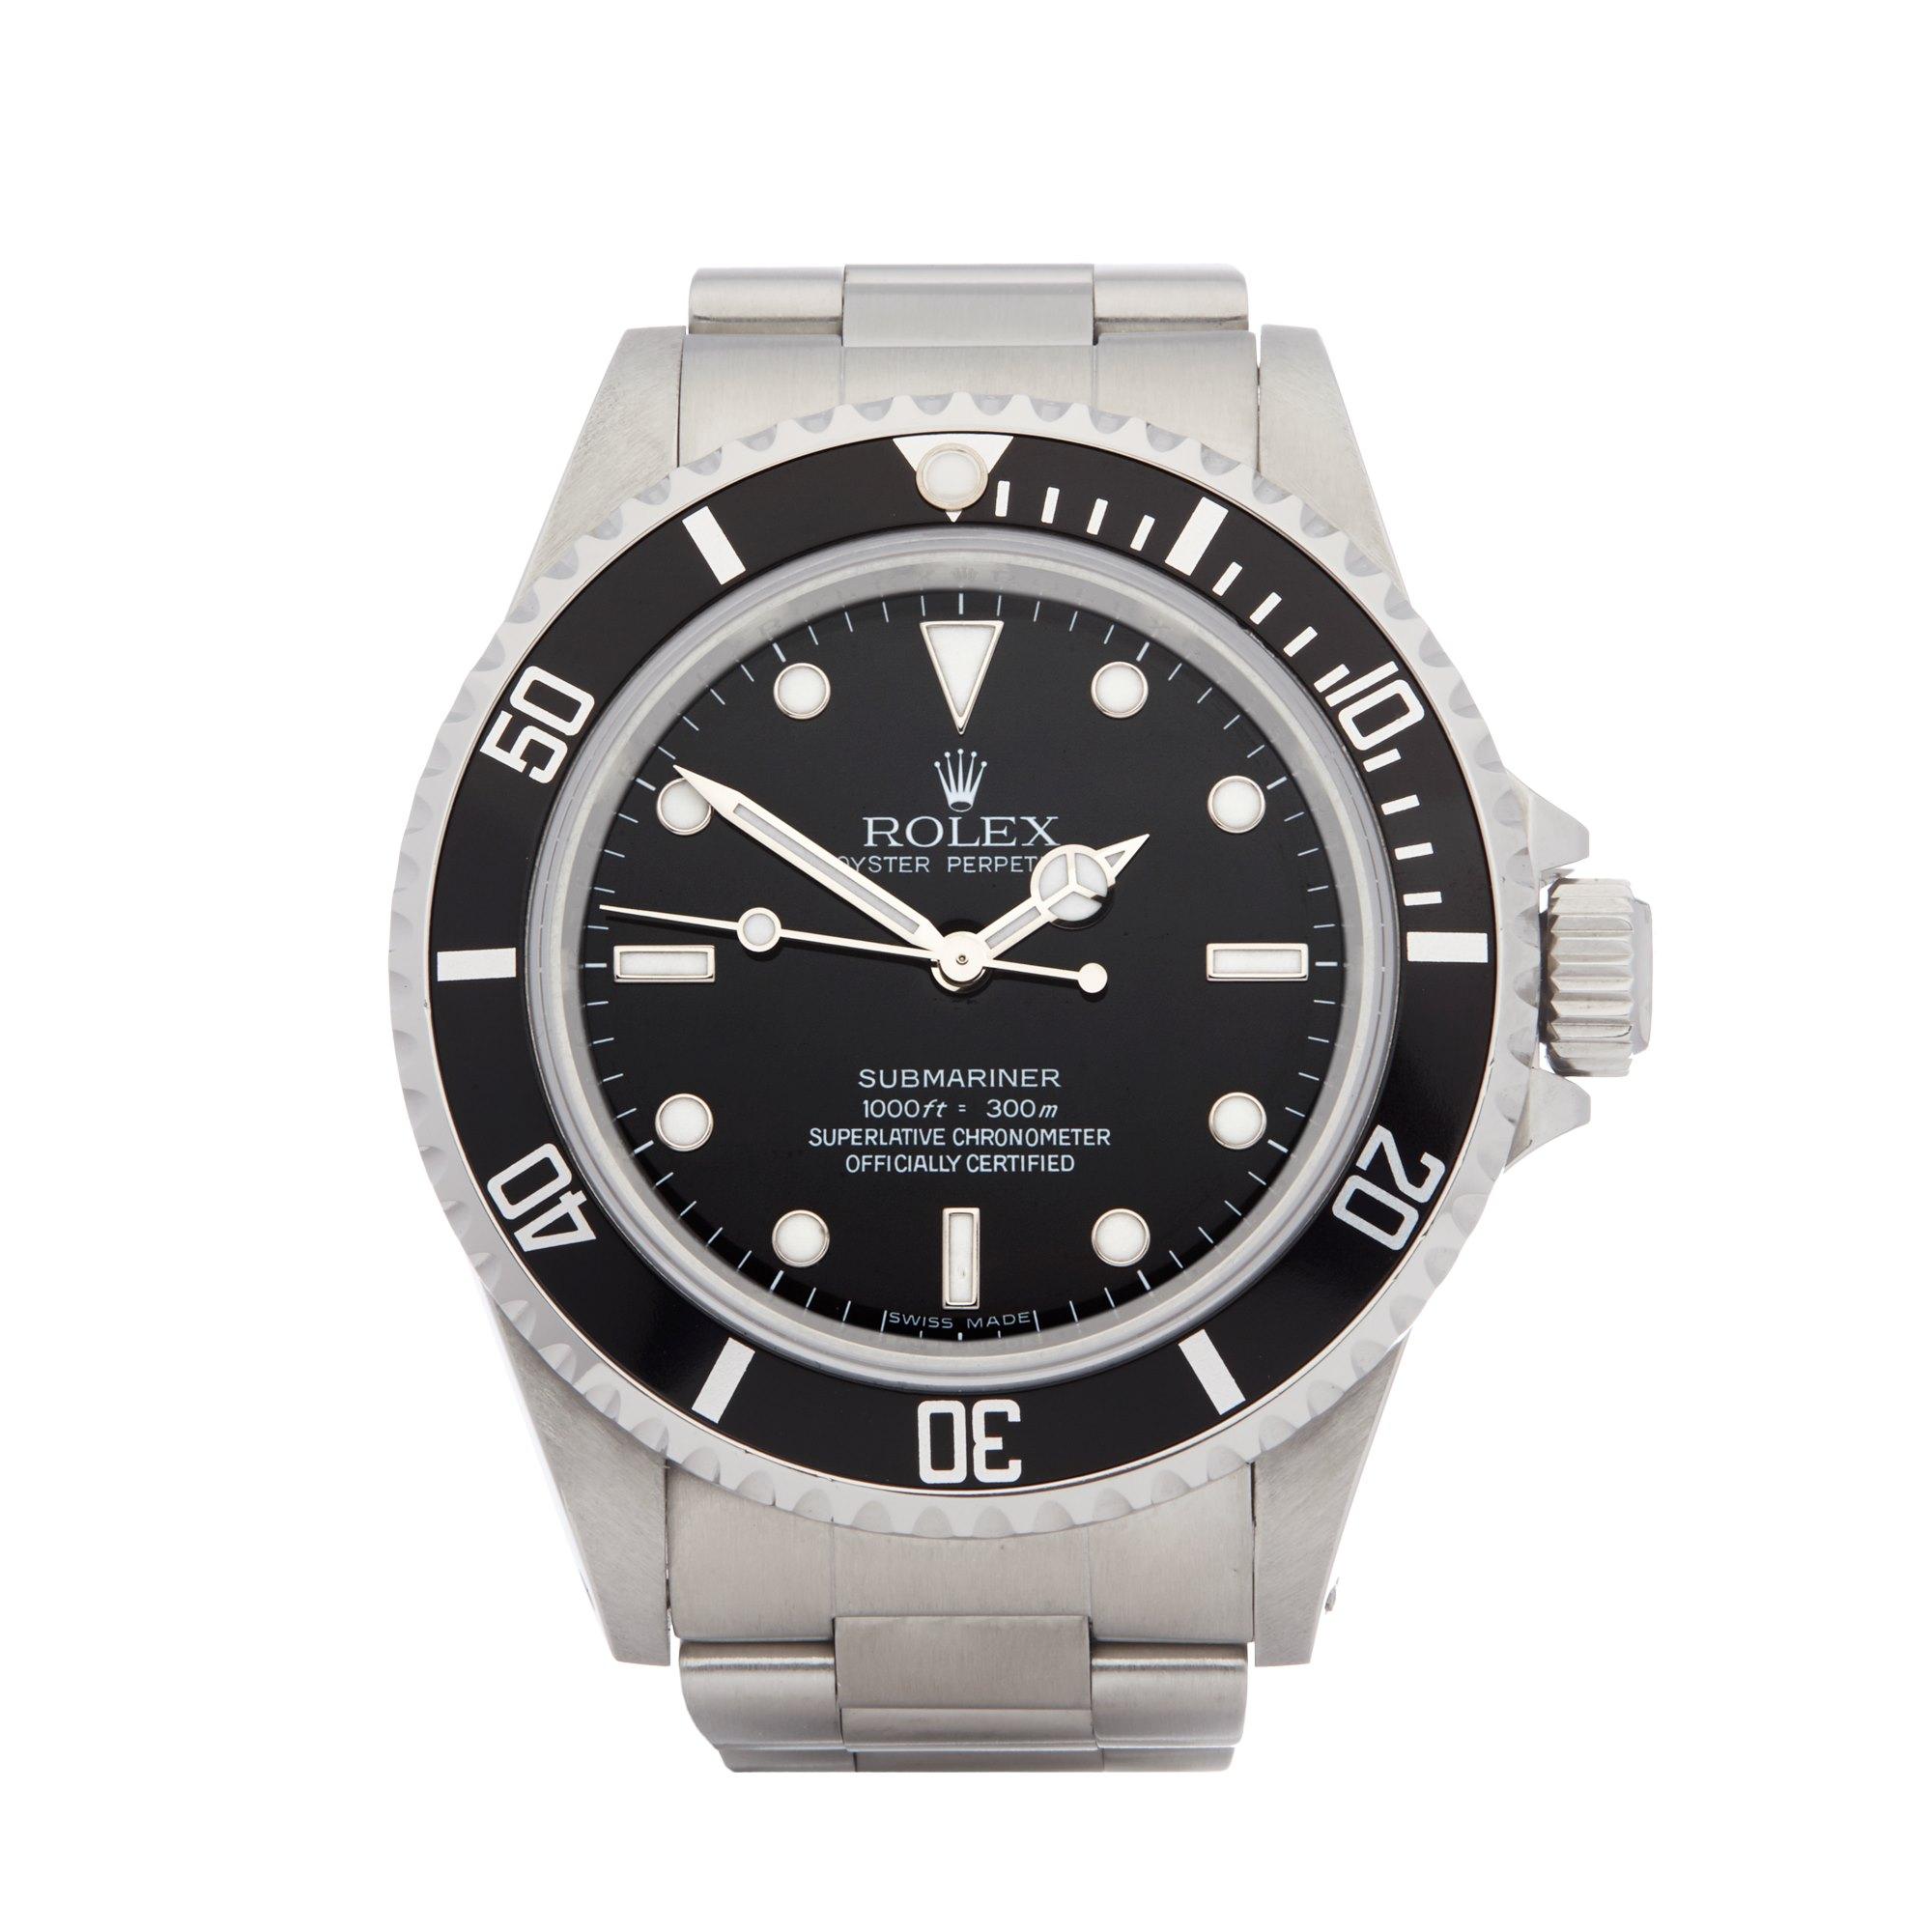 Rolex Submariner Non Date Roestvrij Staal 14060M